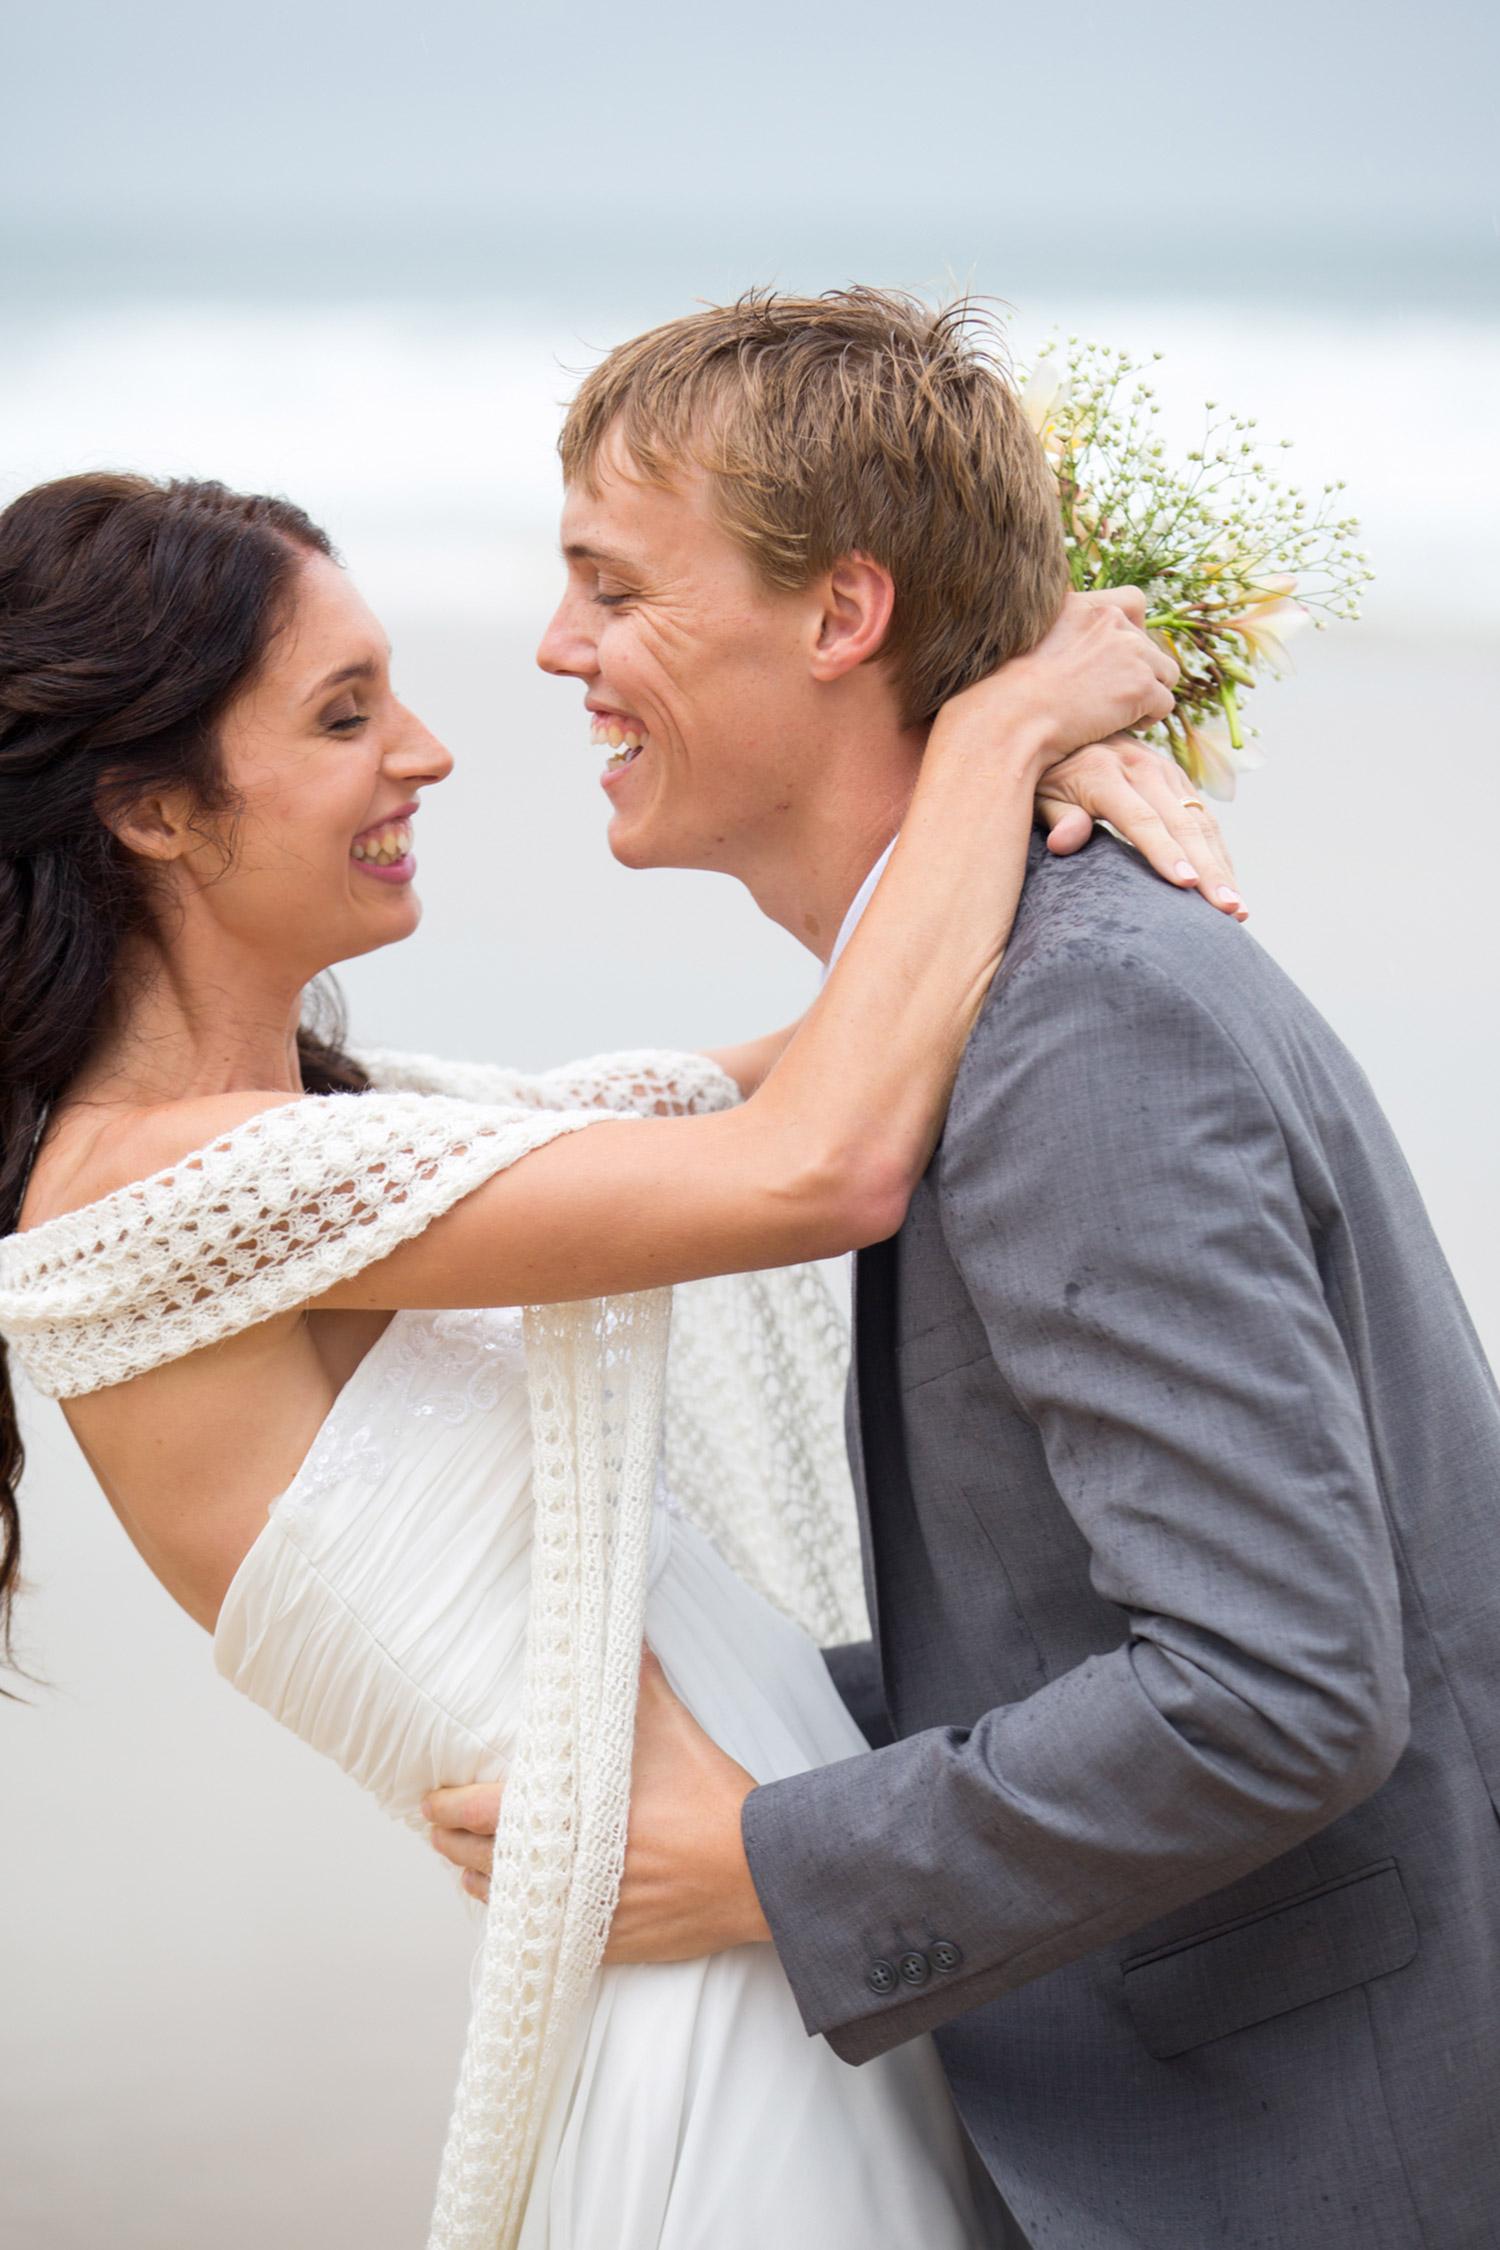 Mooloolaba Beach Pre Wedding Destination Elopement, Brisbane - Noosa, Sunshine Coast, Australian Eco Elopement Photographers